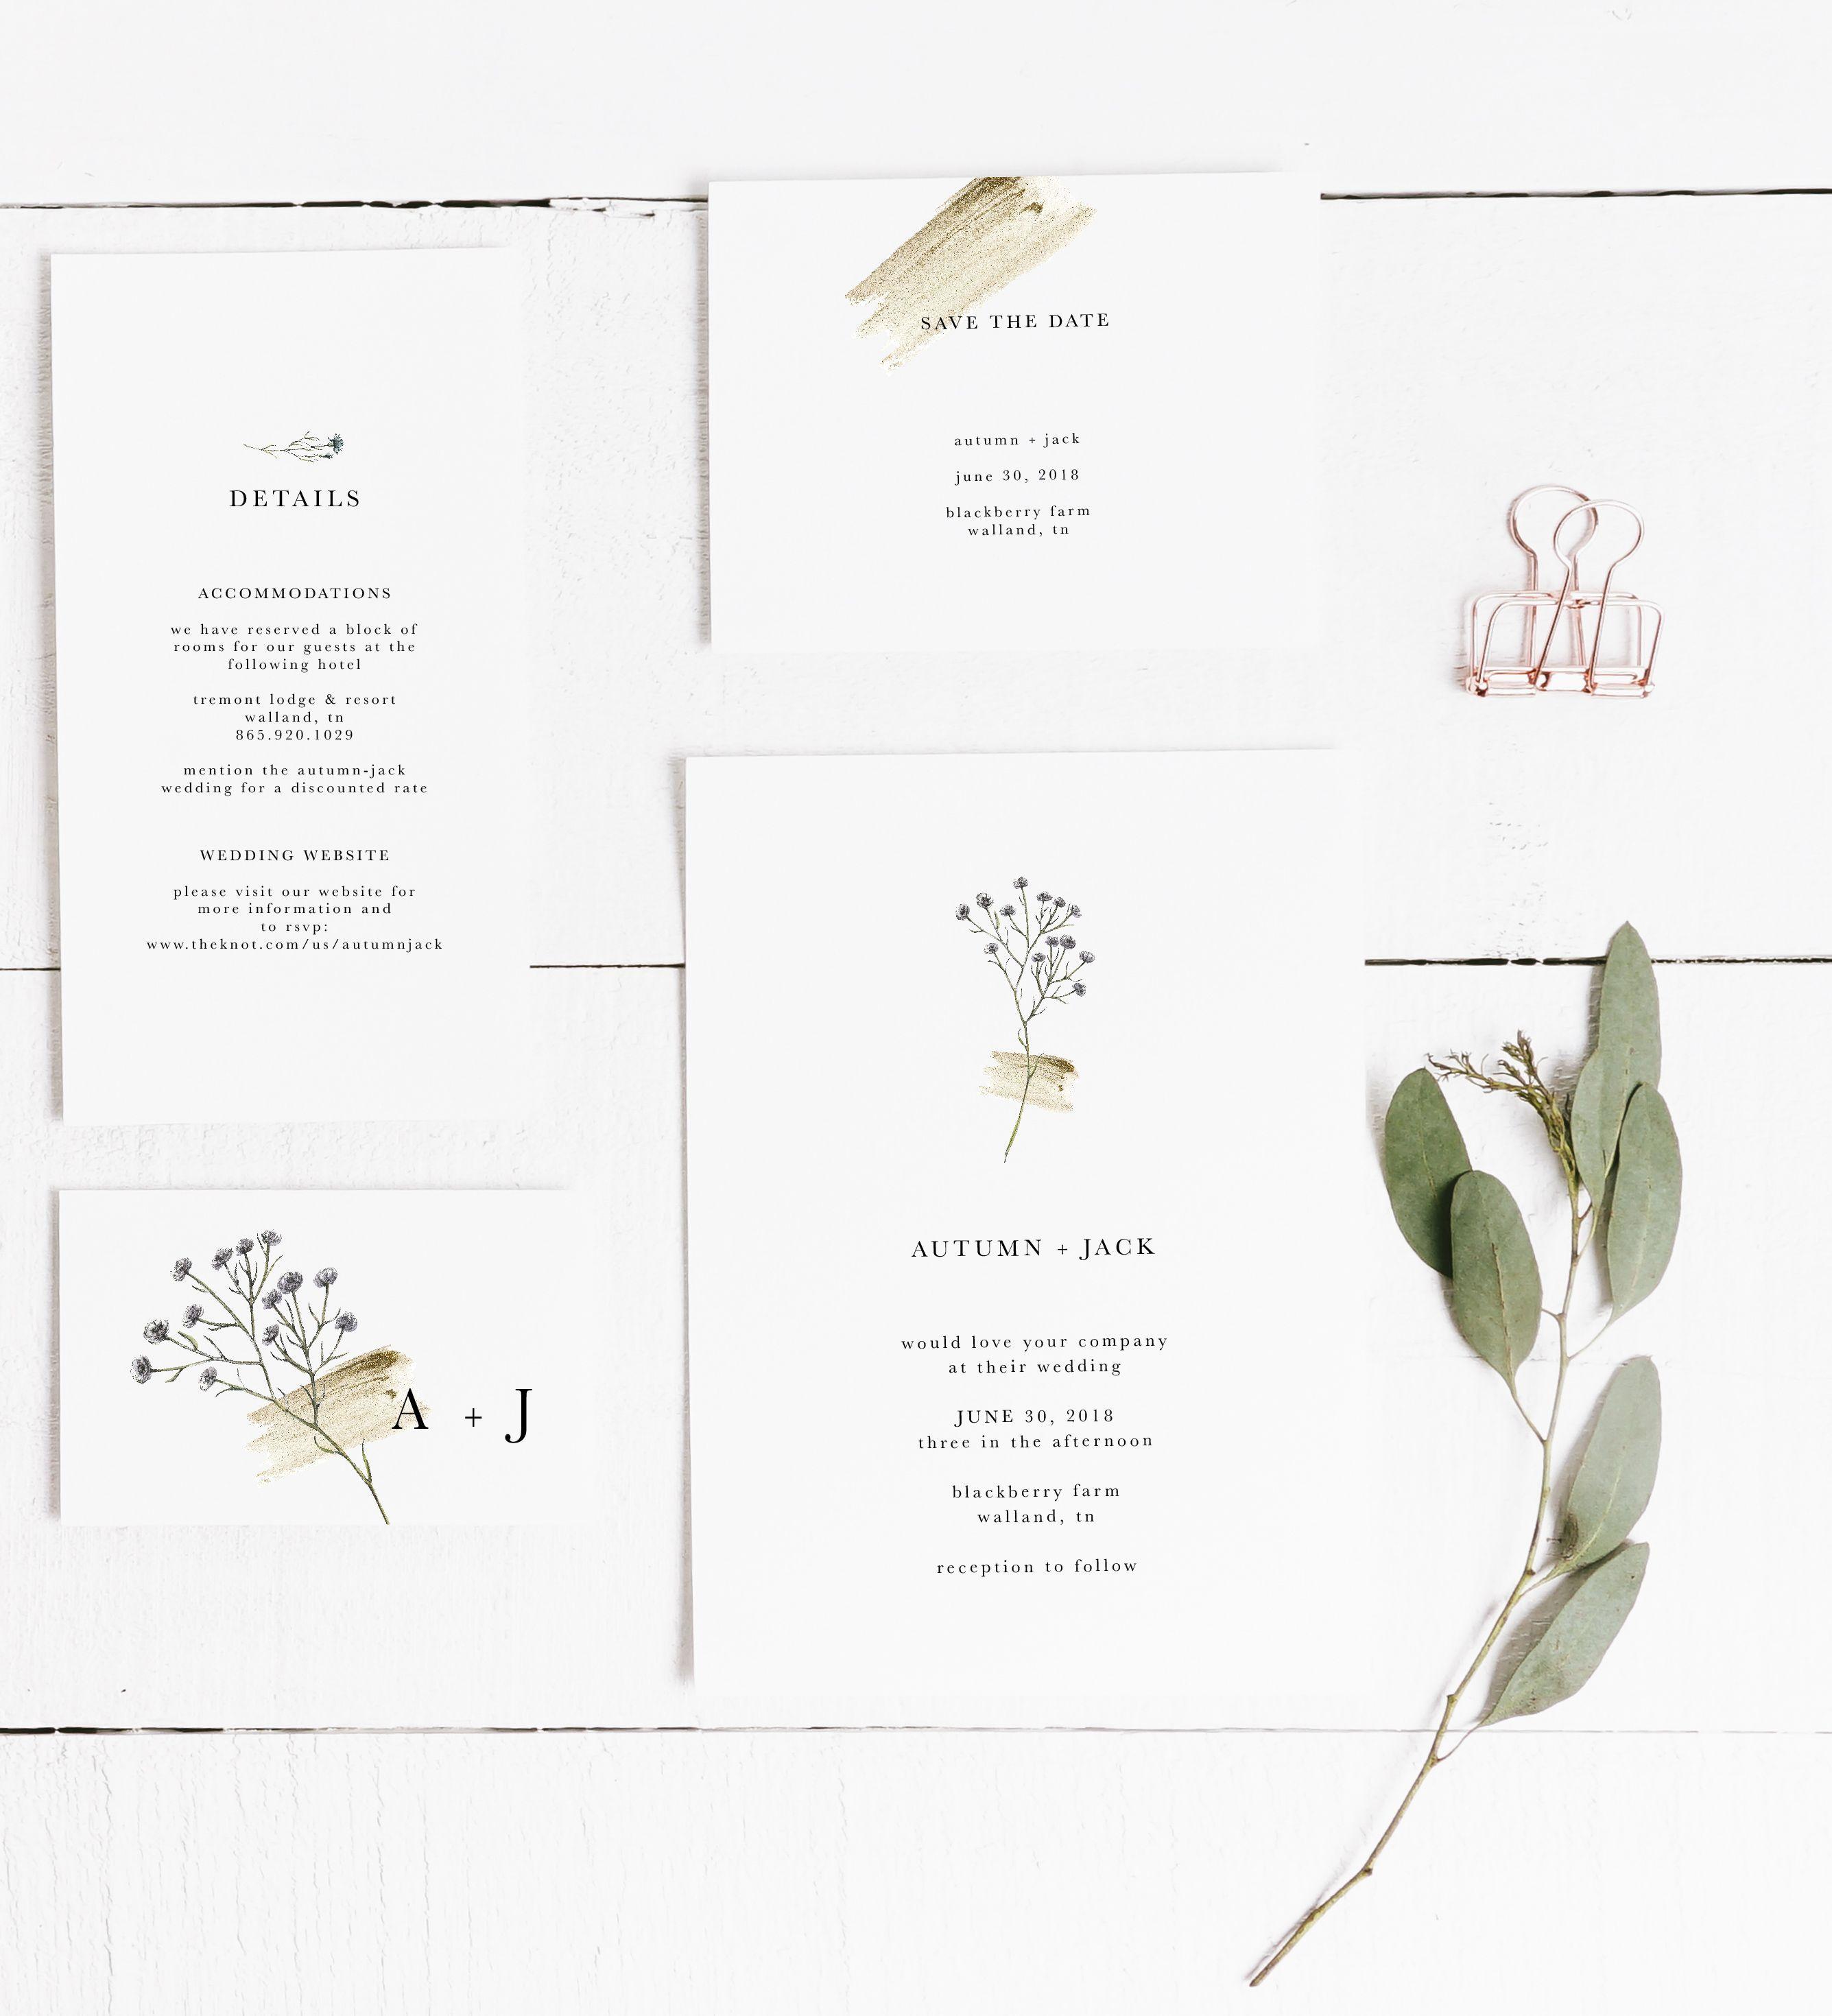 Simple Wedding Invitation Modern Wedding Invitation Wedding Invitation In 2020 Floral Wedding Invitations Eucalyptus Wedding Invitation Silver Wedding Invitations